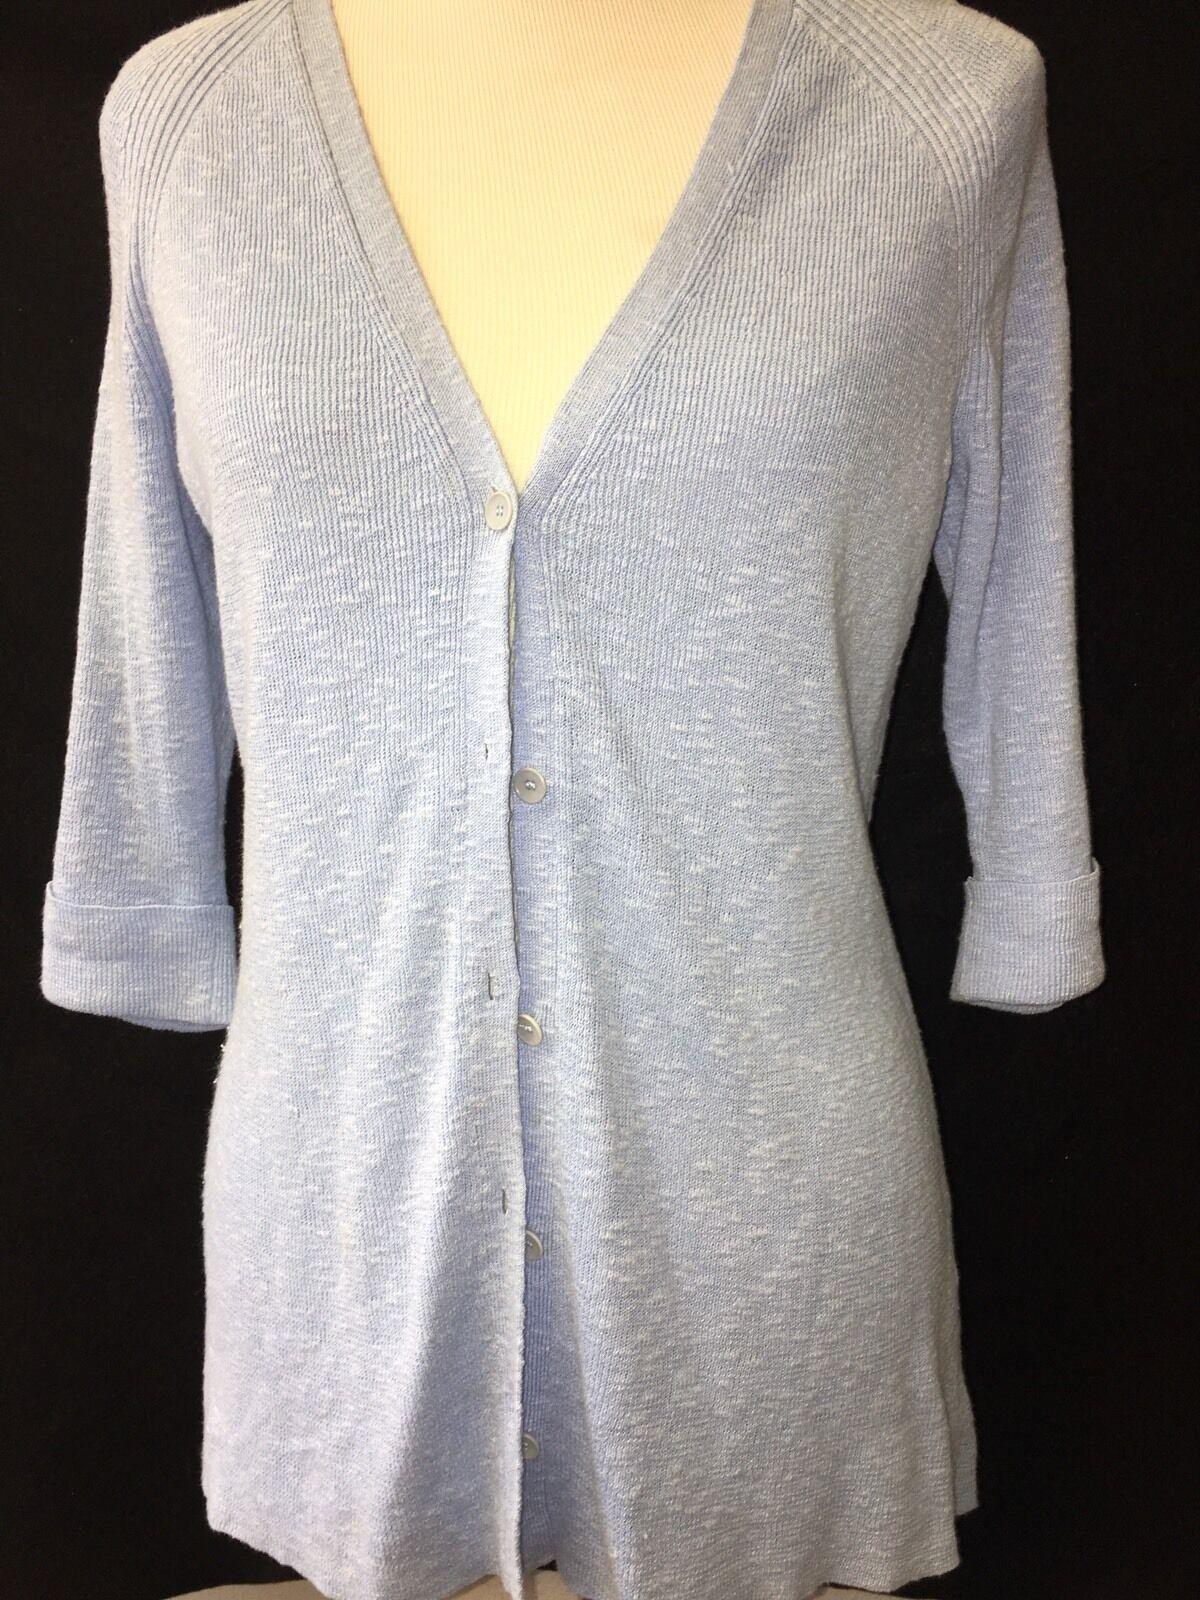 Eileen Fisher Button Front Cardigan bluee Linen Blend Tunic 3 4 Sleeve Textured